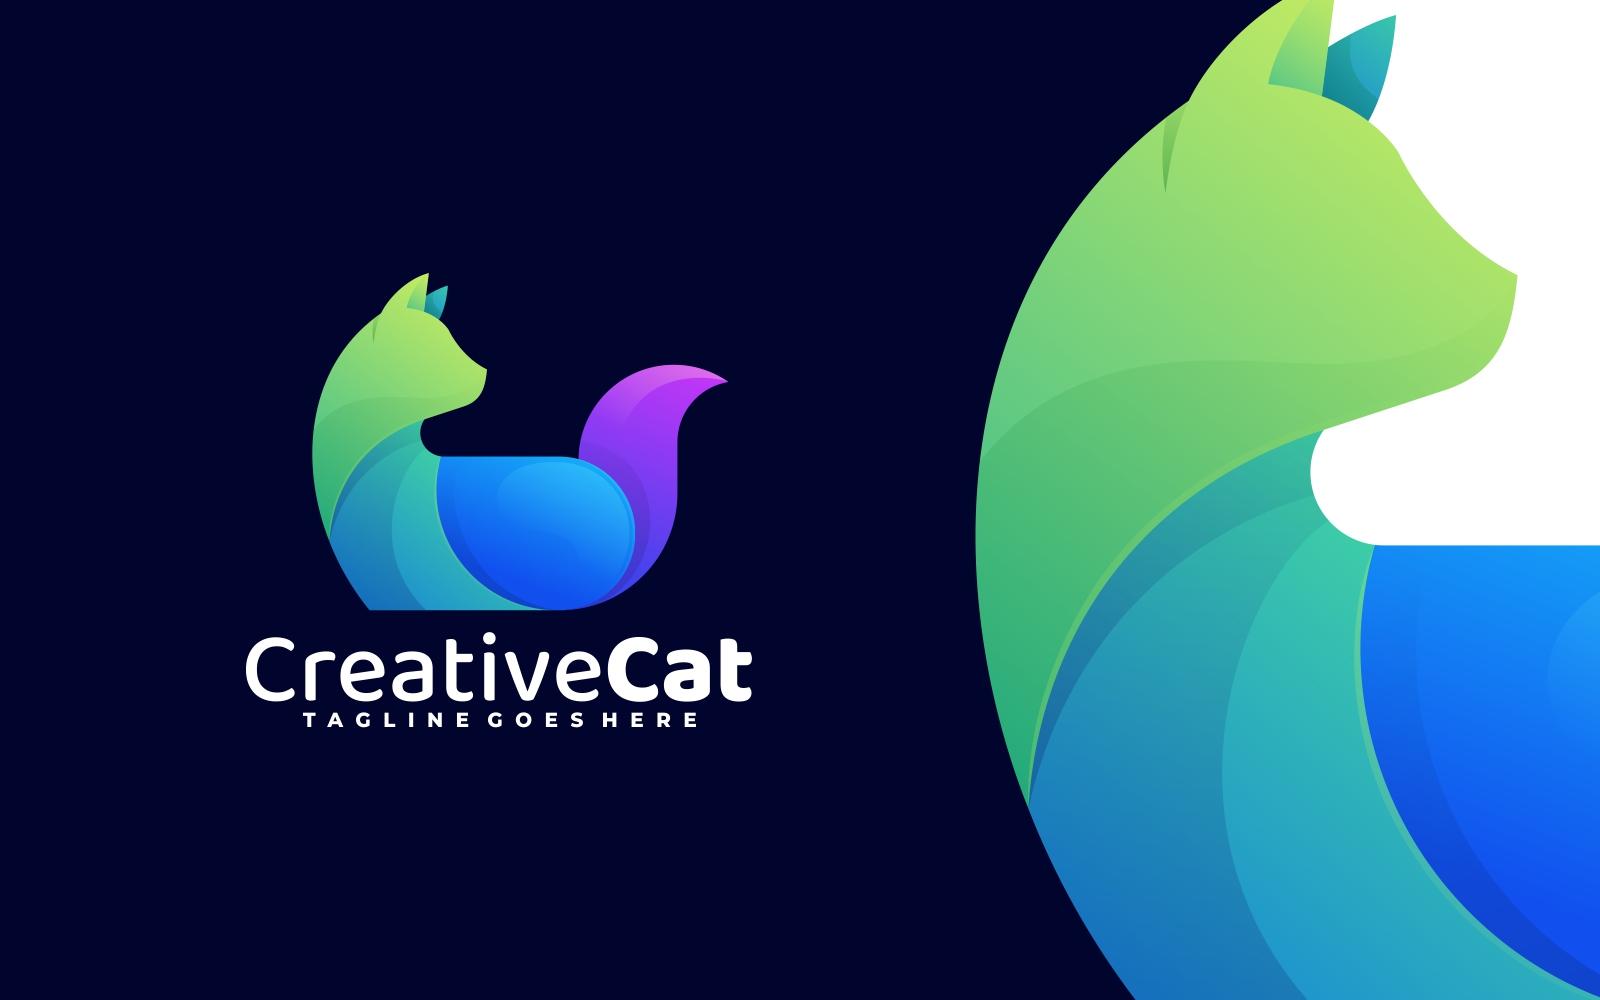 Creative Cat 3D Gradient Logo - Green, Blue and Purple